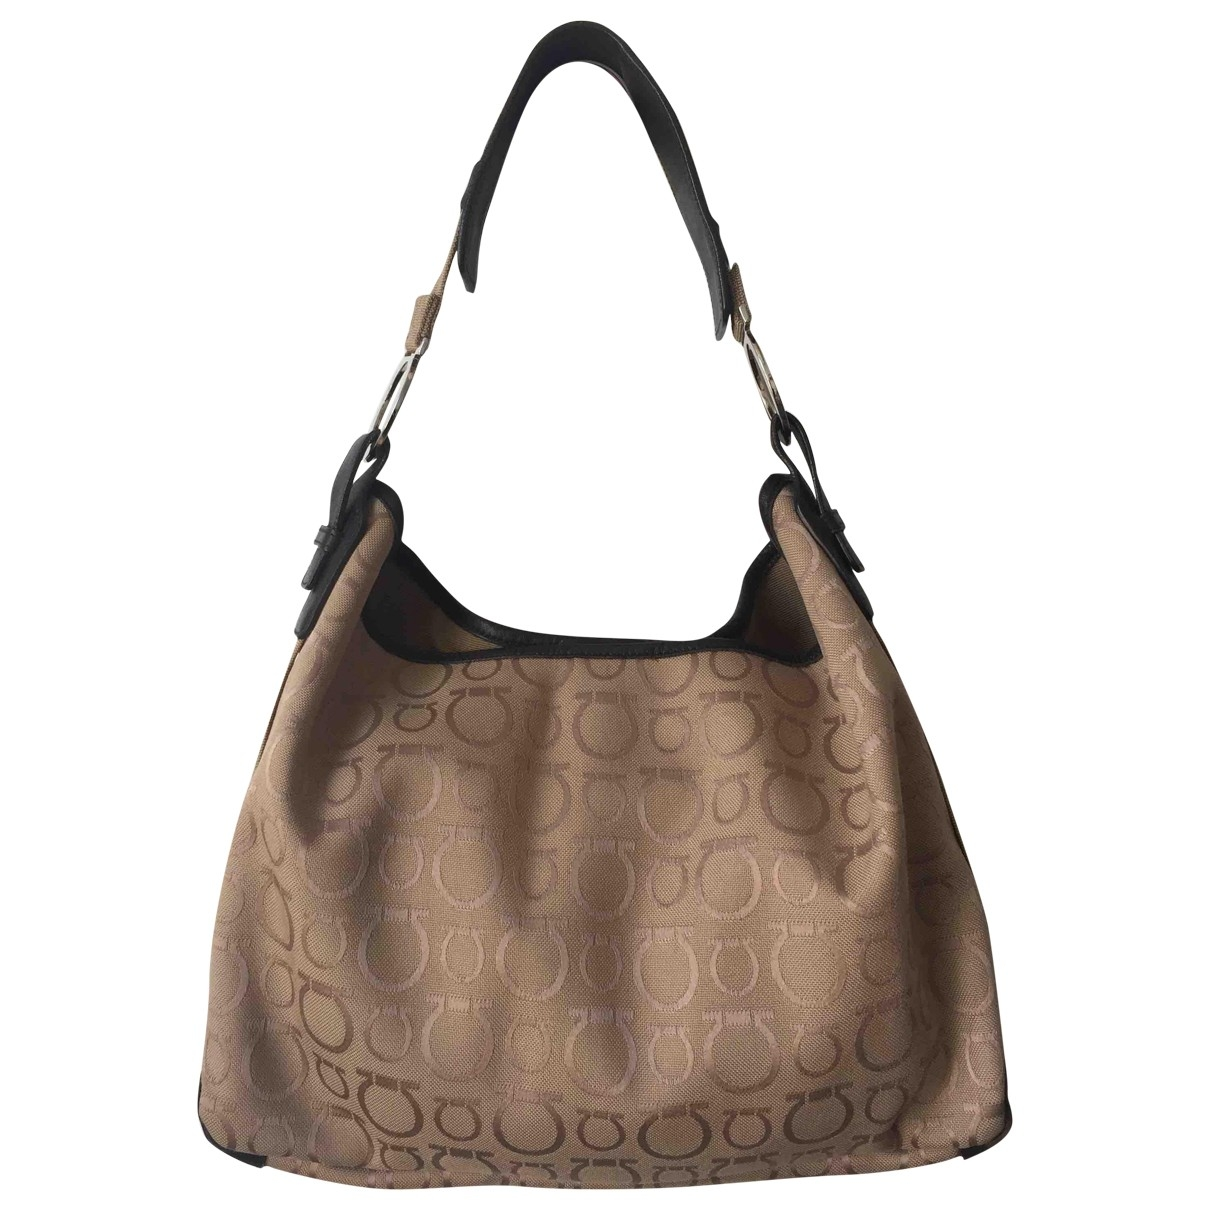 Salvatore Ferragamo \N Beige Cloth handbag for Women \N